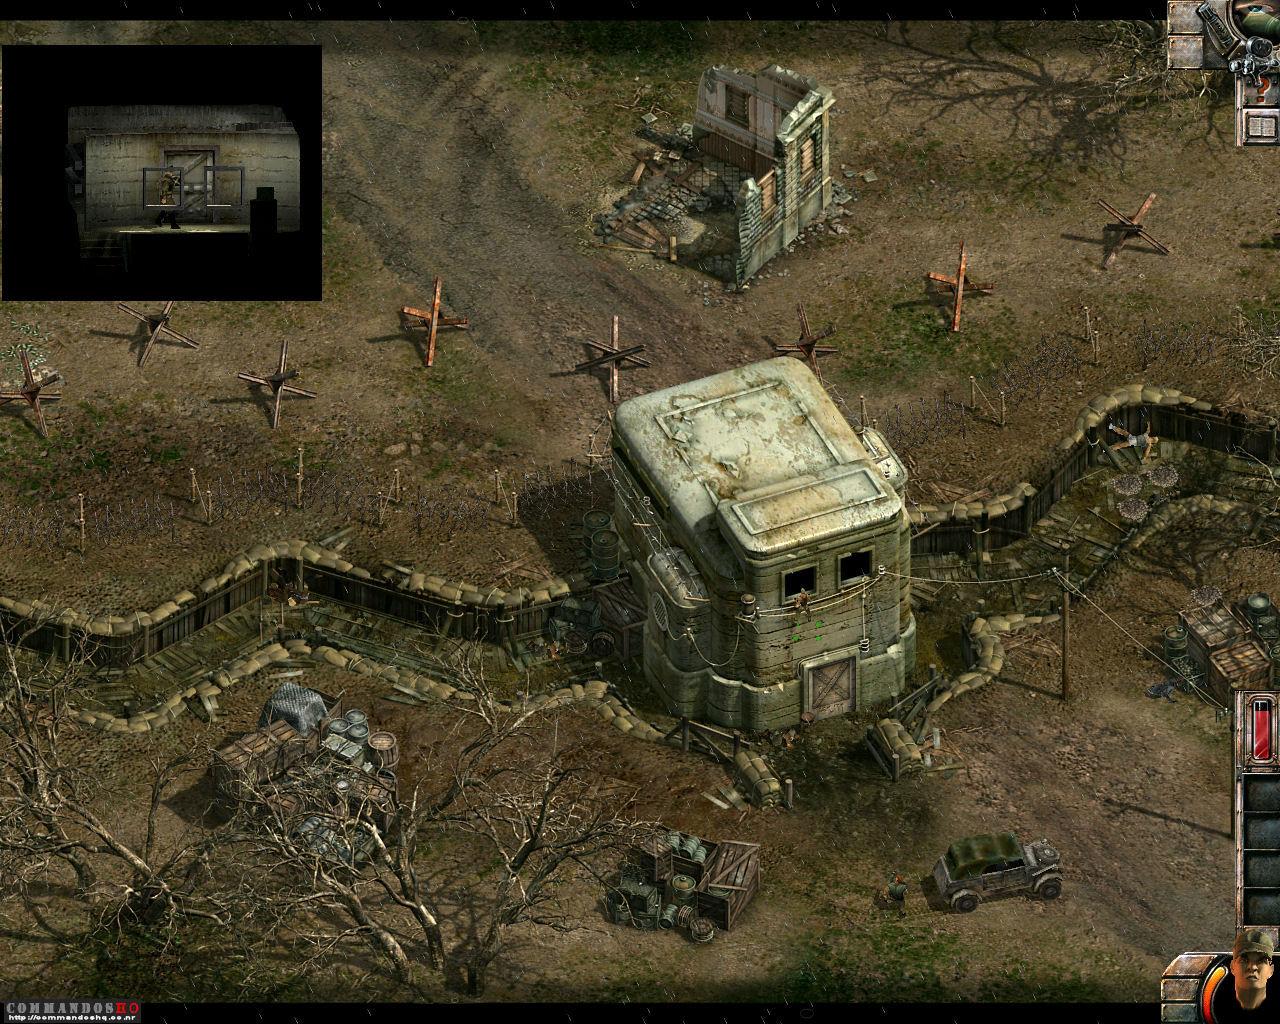 Commando2 commando 2 cheats all weapons unlocked unlimited ammo